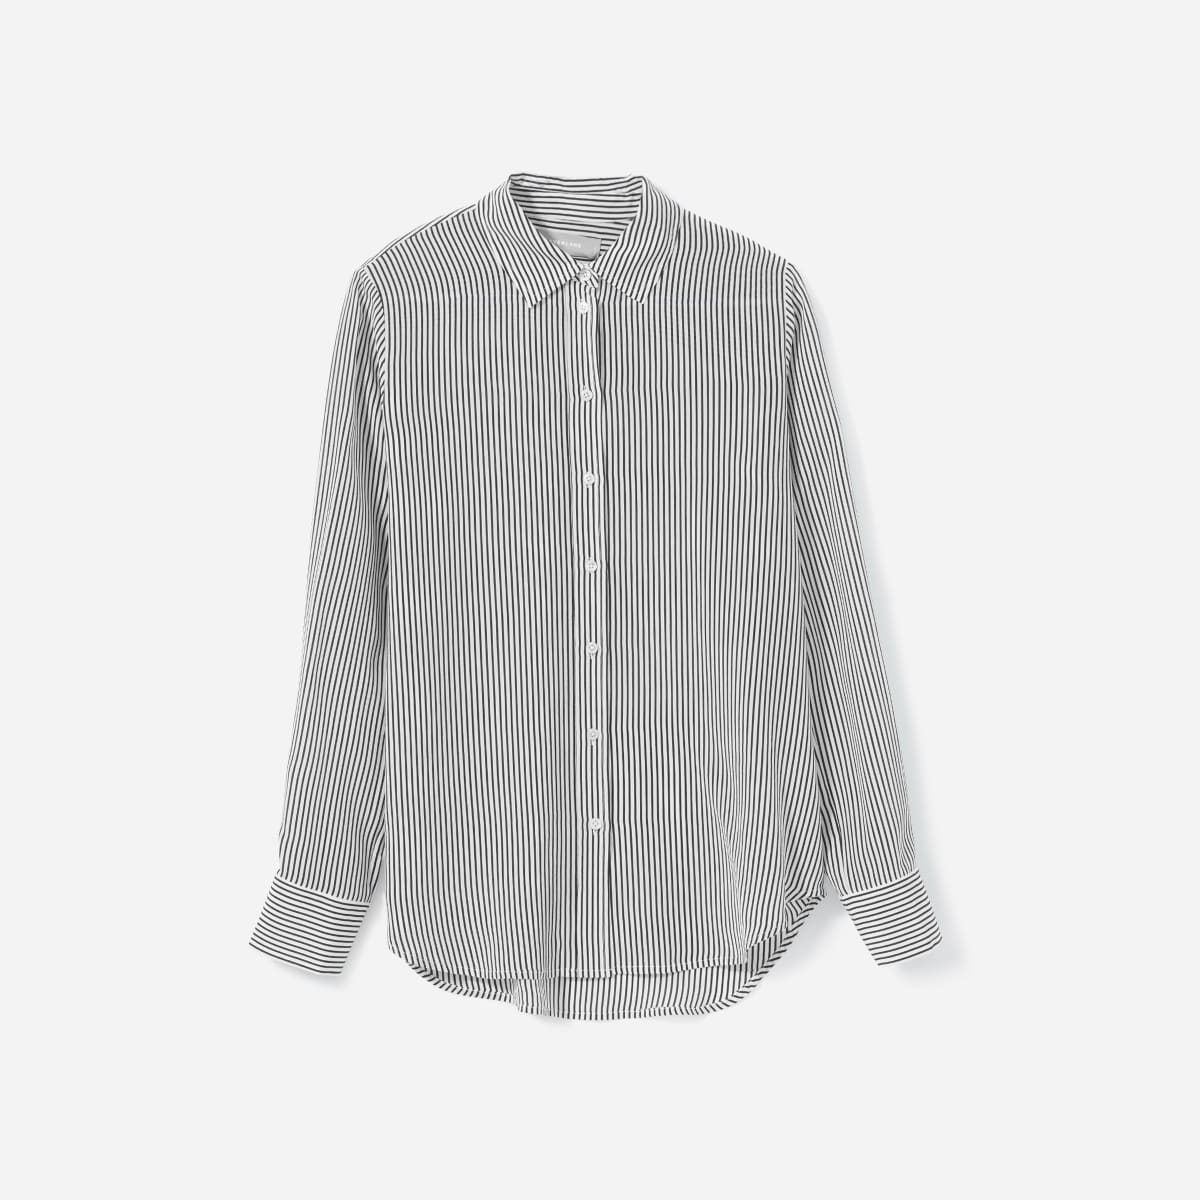 The Clean Silk Relaxed Shirt   Everlane